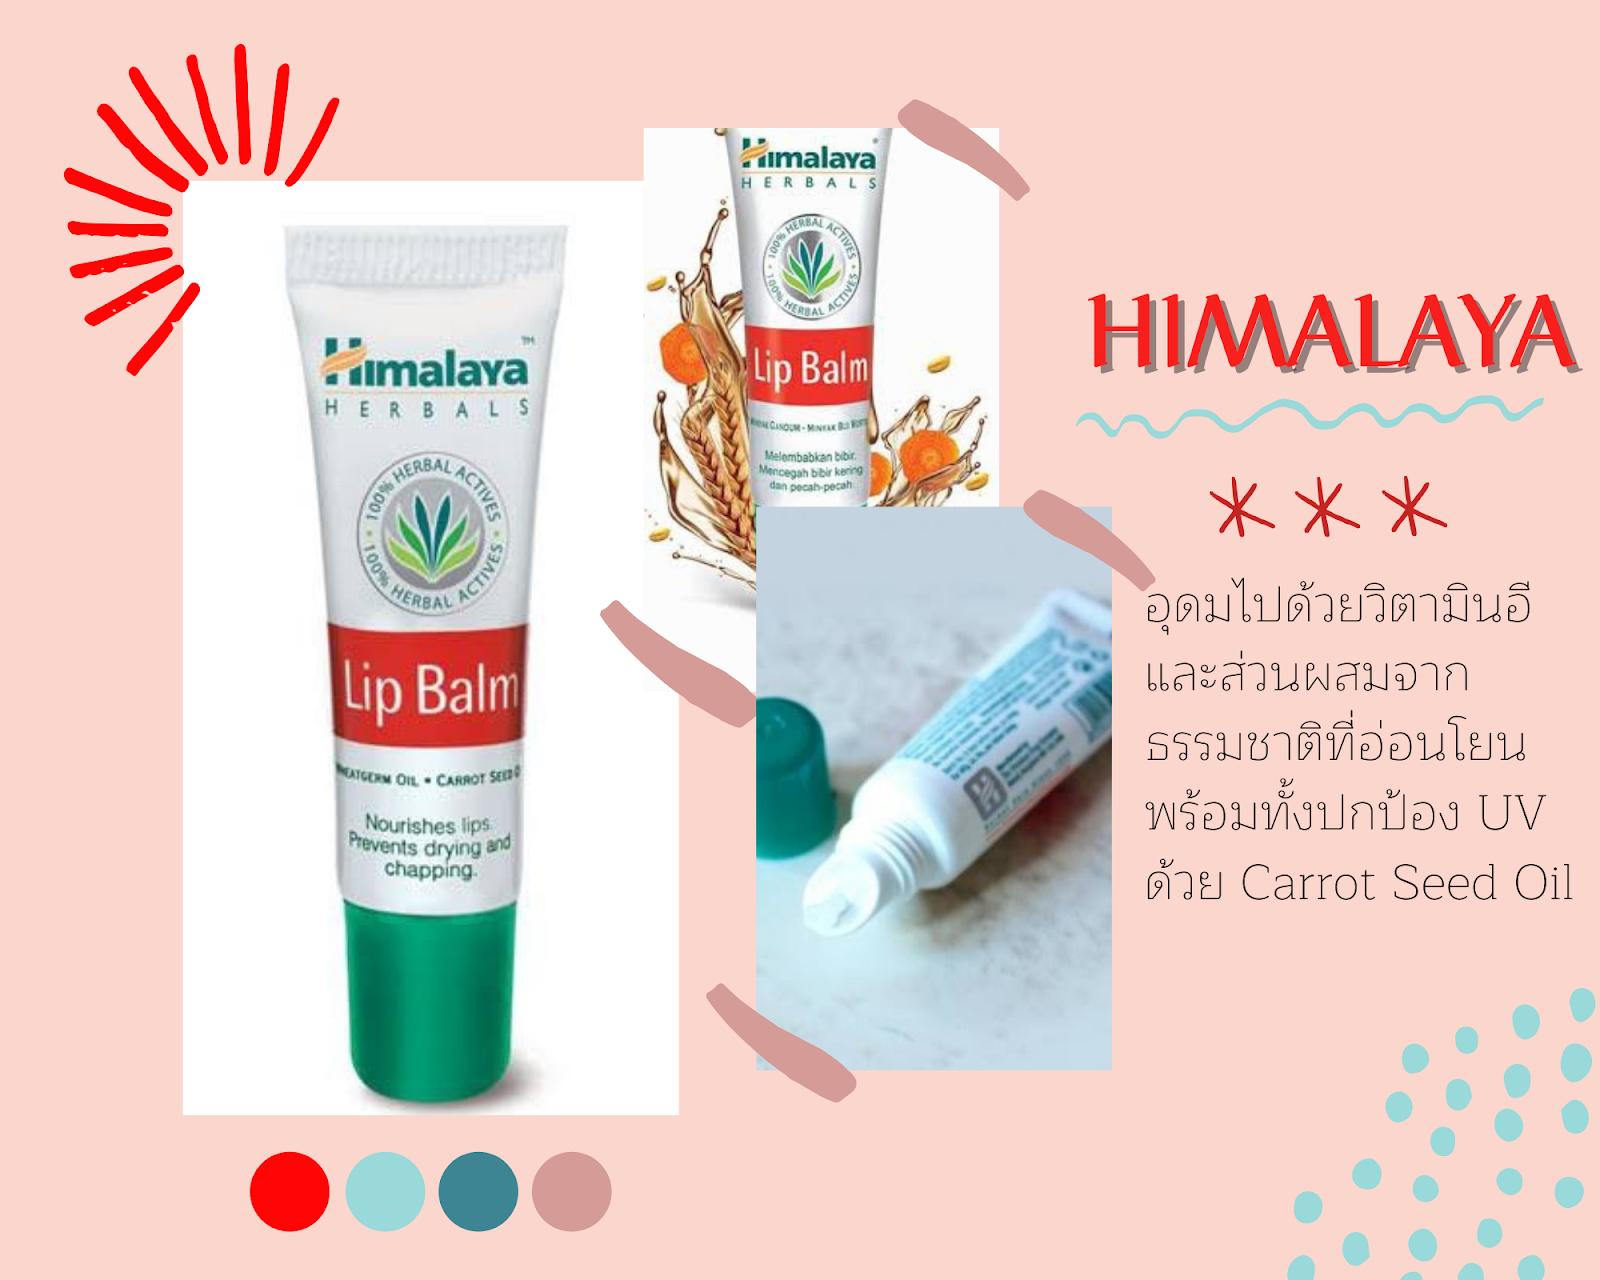 8. Herbals Lip Balm